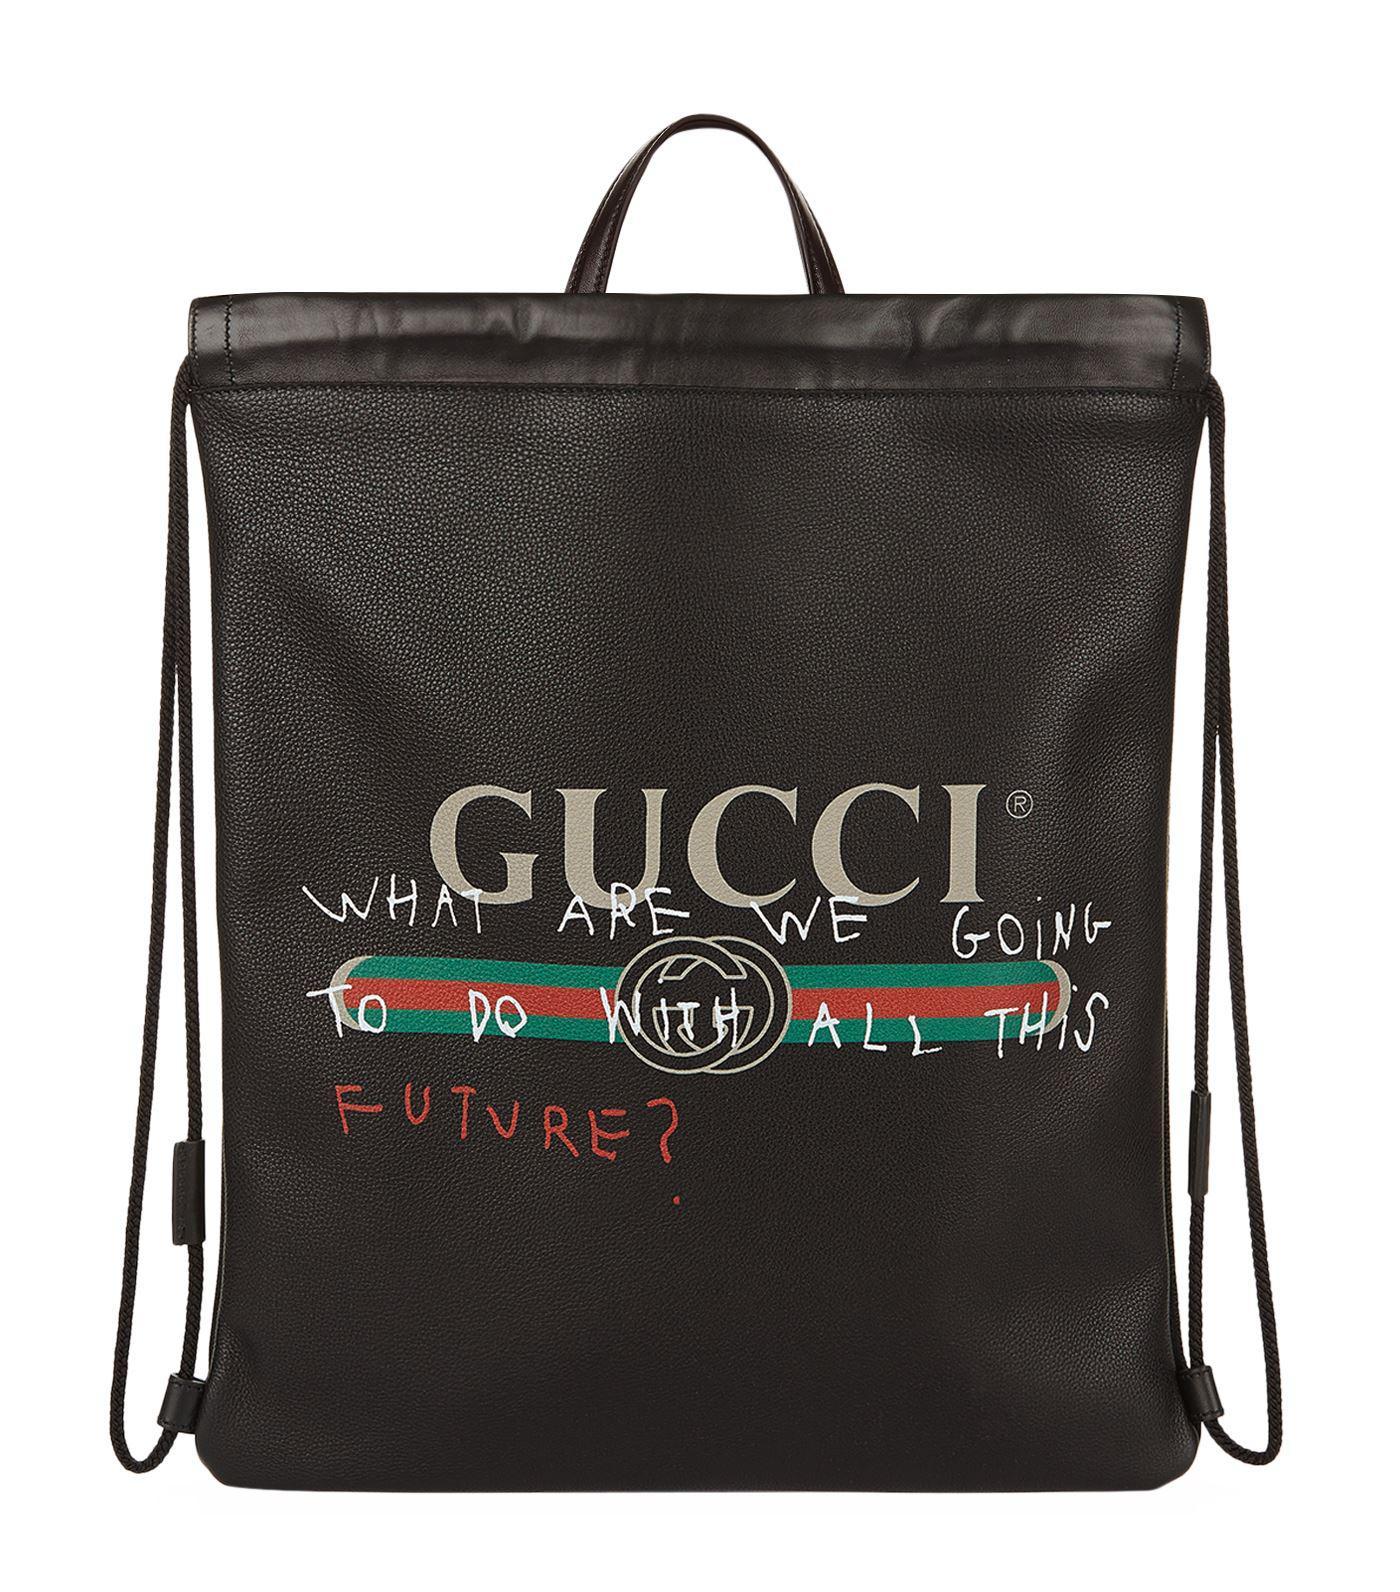 c1d7677360c7 Gucci Slogan Logo Print Drawstring Bag in Black - Lyst